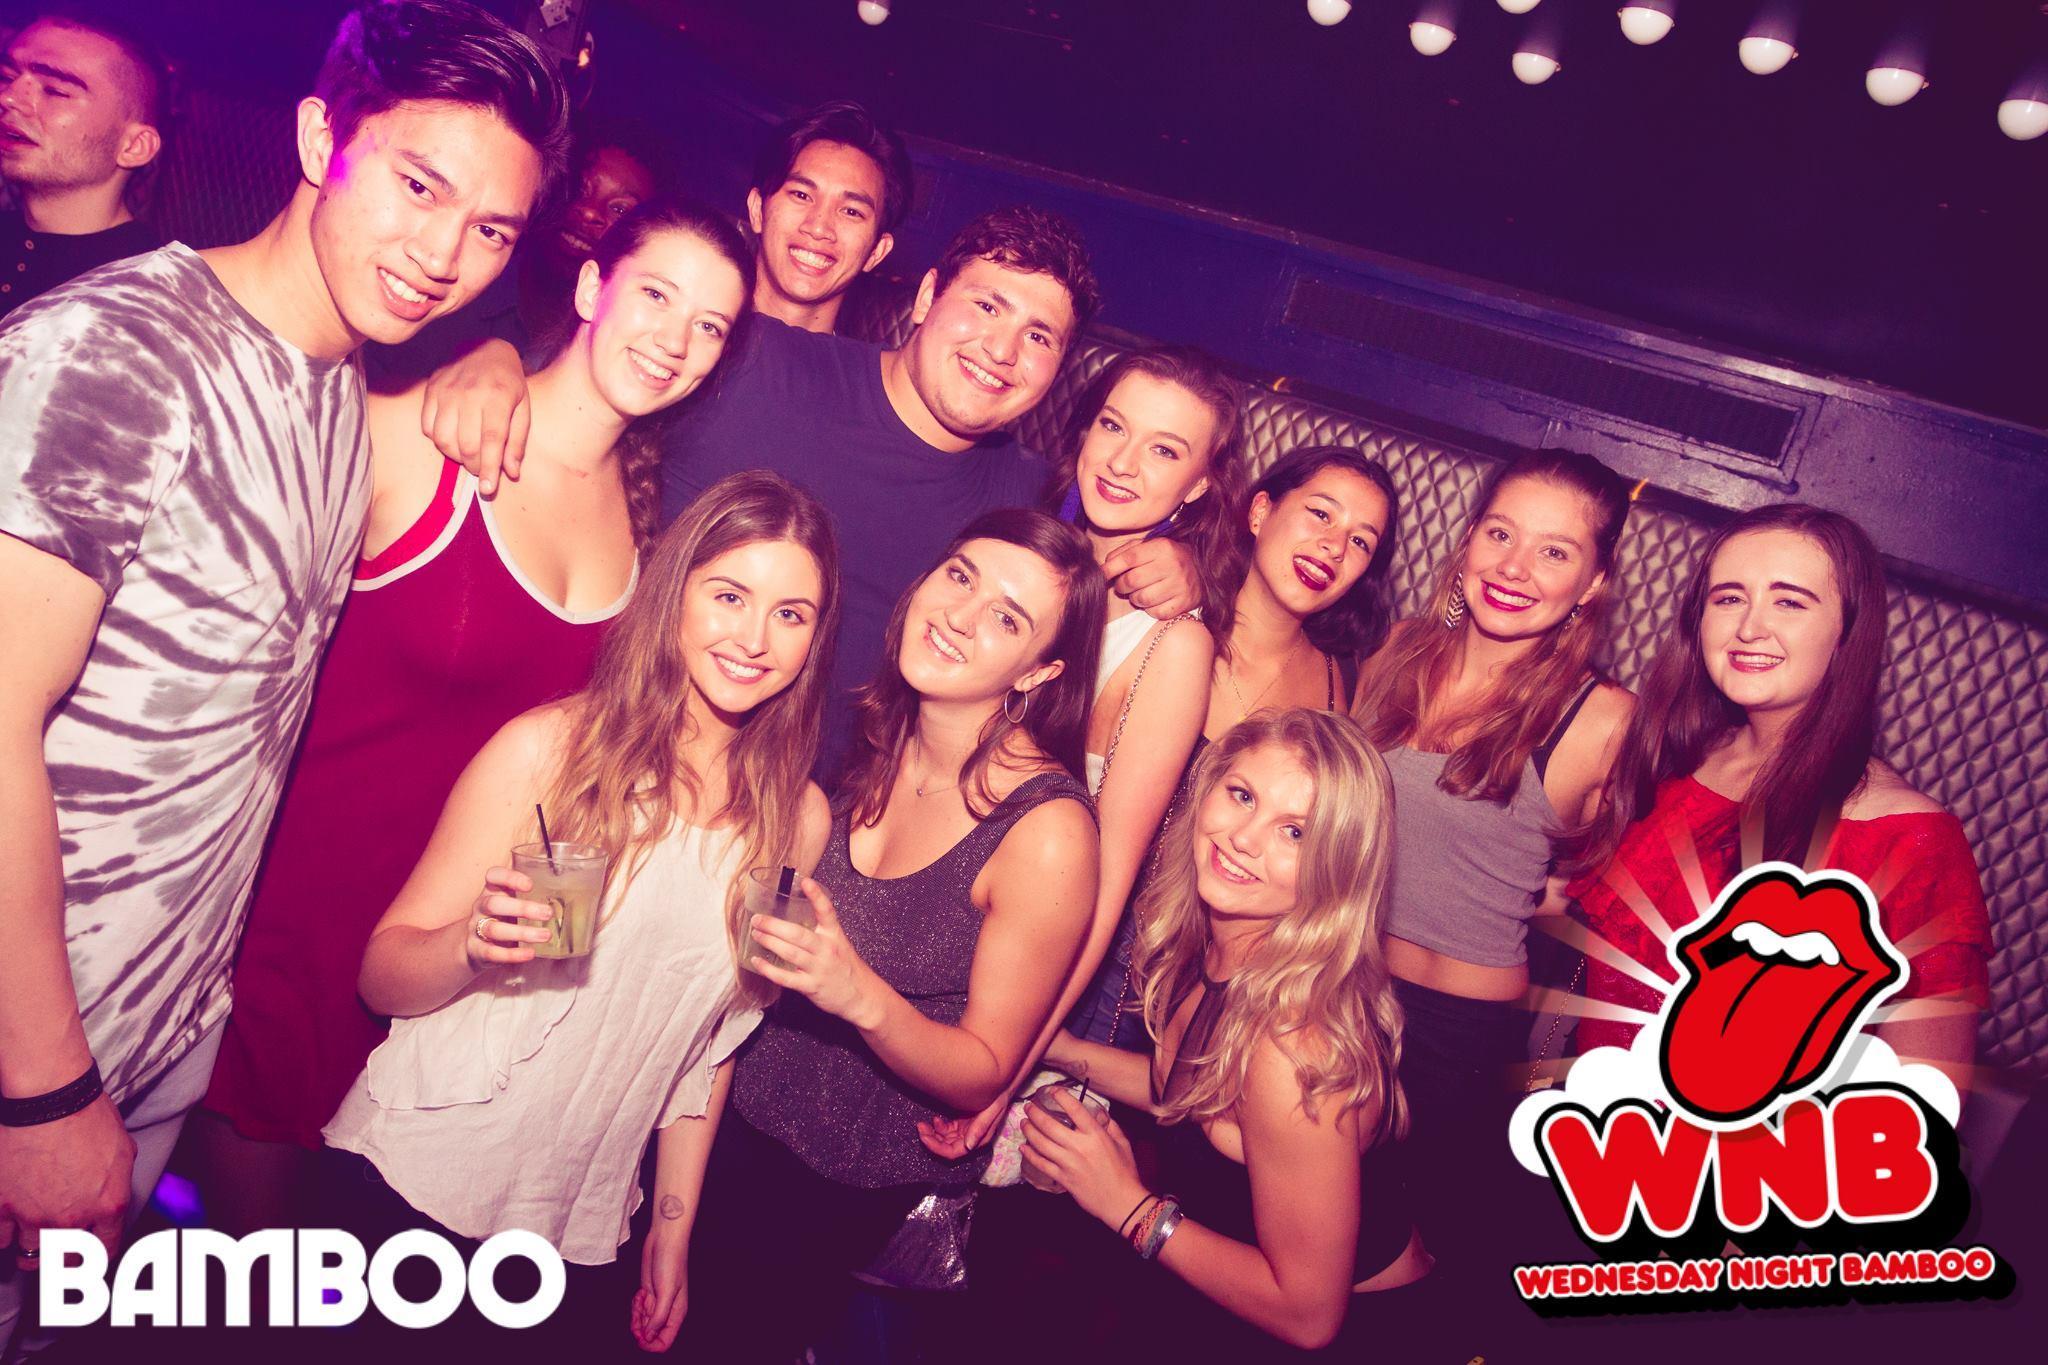 Imagine having this many friends